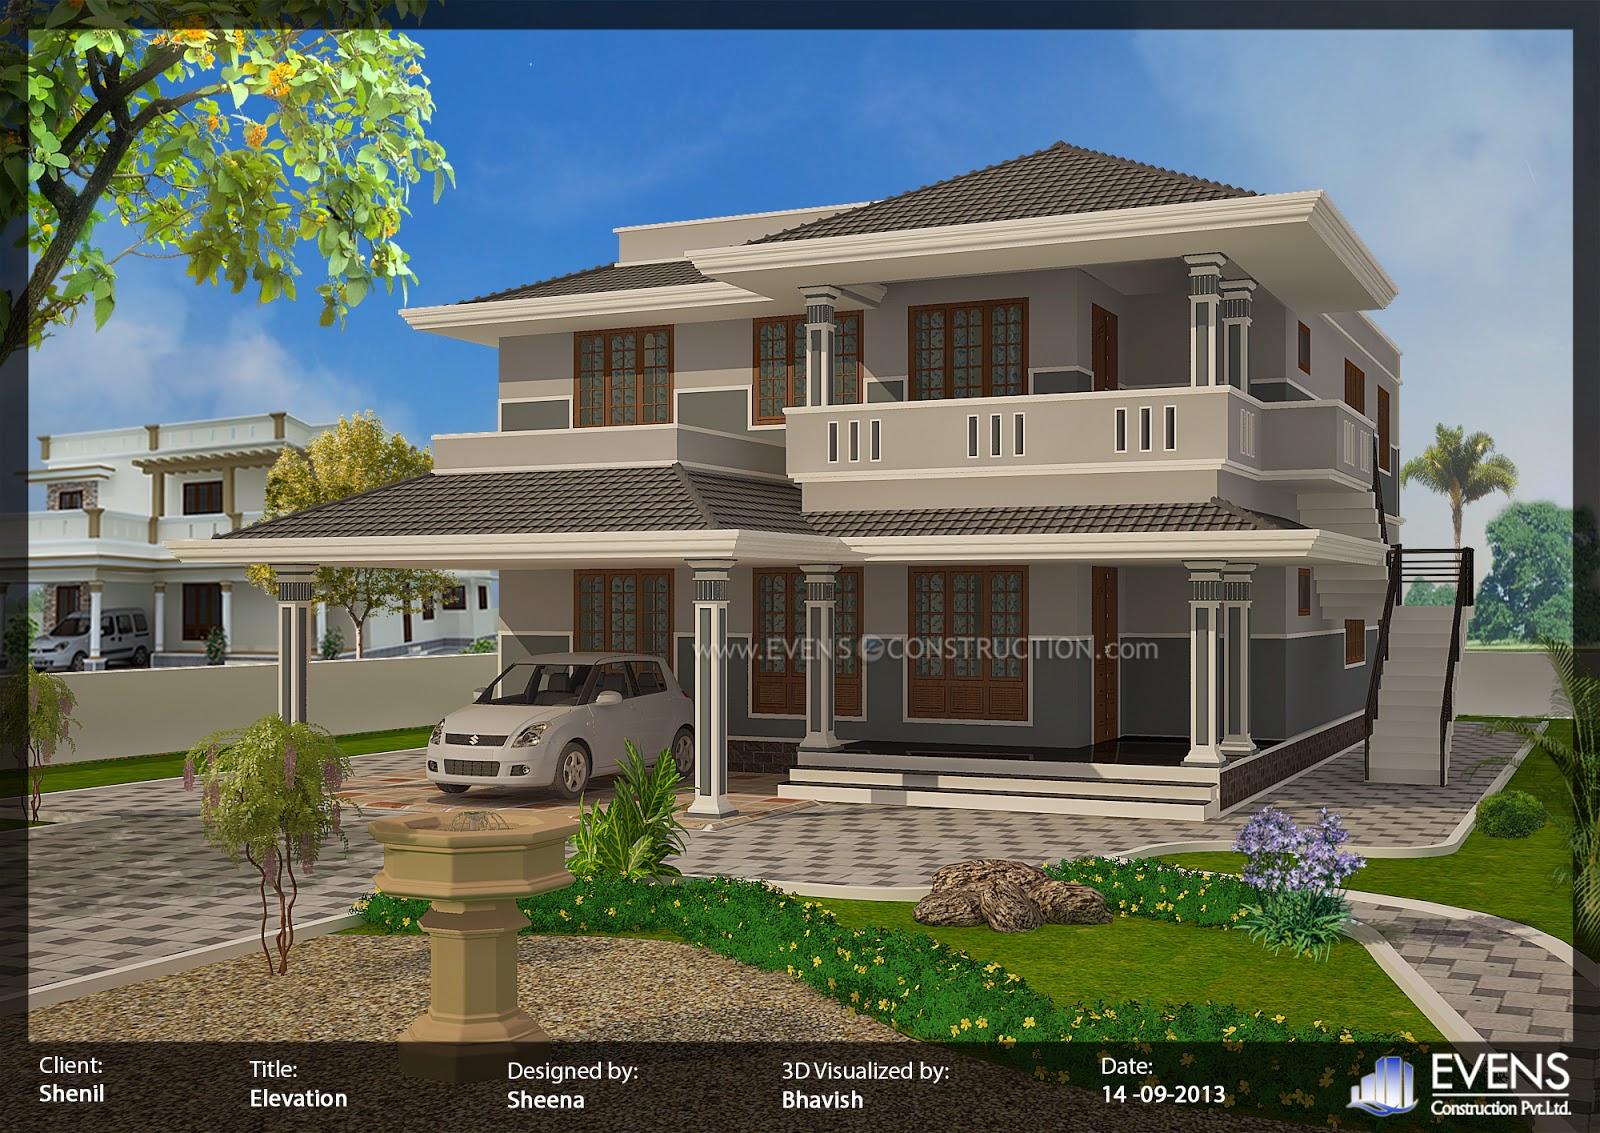 Modern 4 bedroom house design for 4 bedroom house exterior design